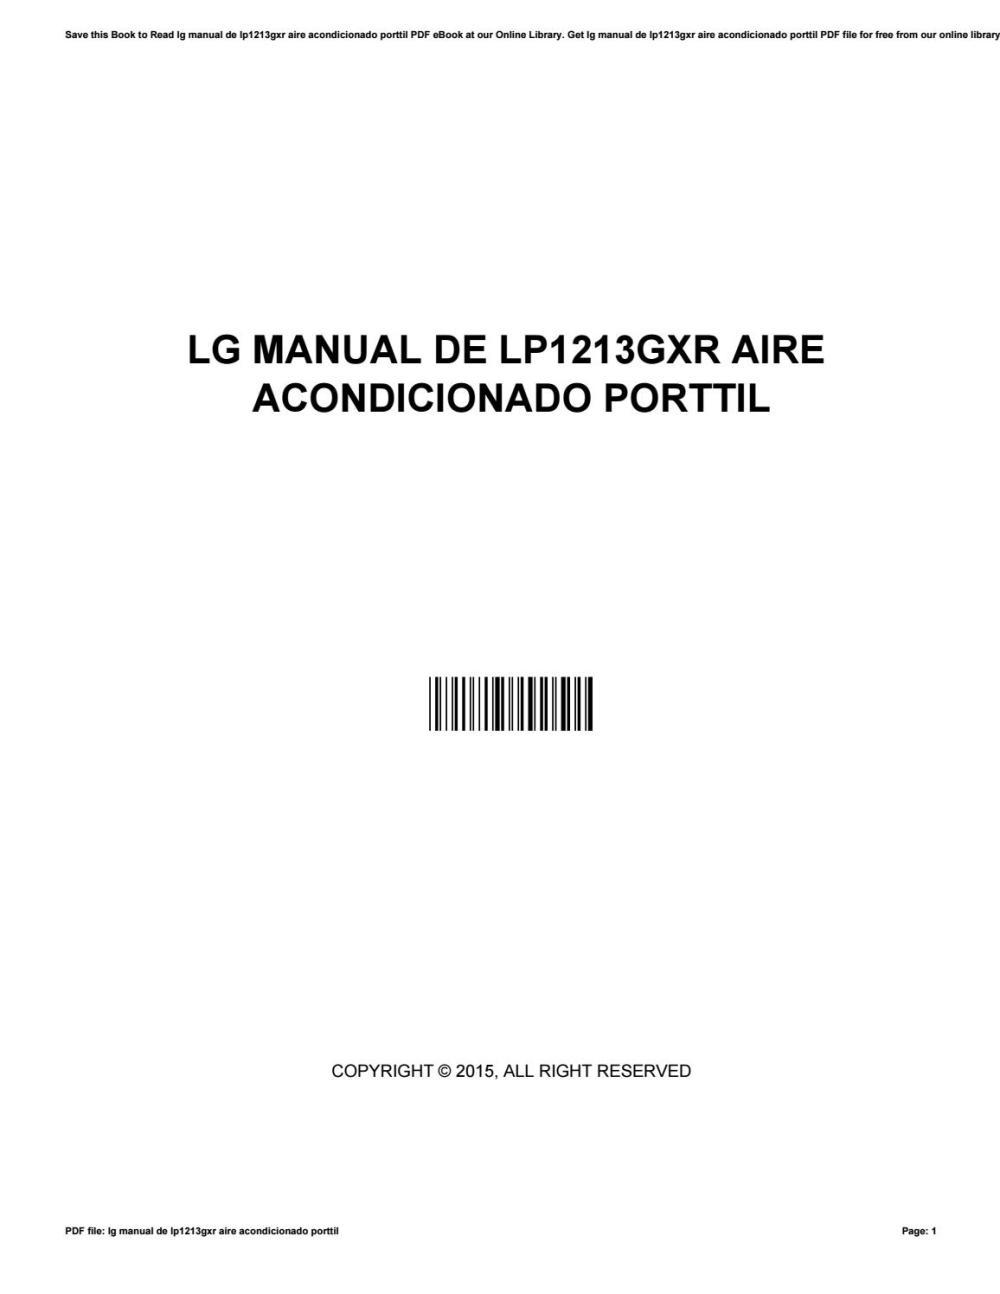 medium resolution of  array lg manual de lp1213gxr aire acondicionado porttil by jamiegorman3869 rh issuu com